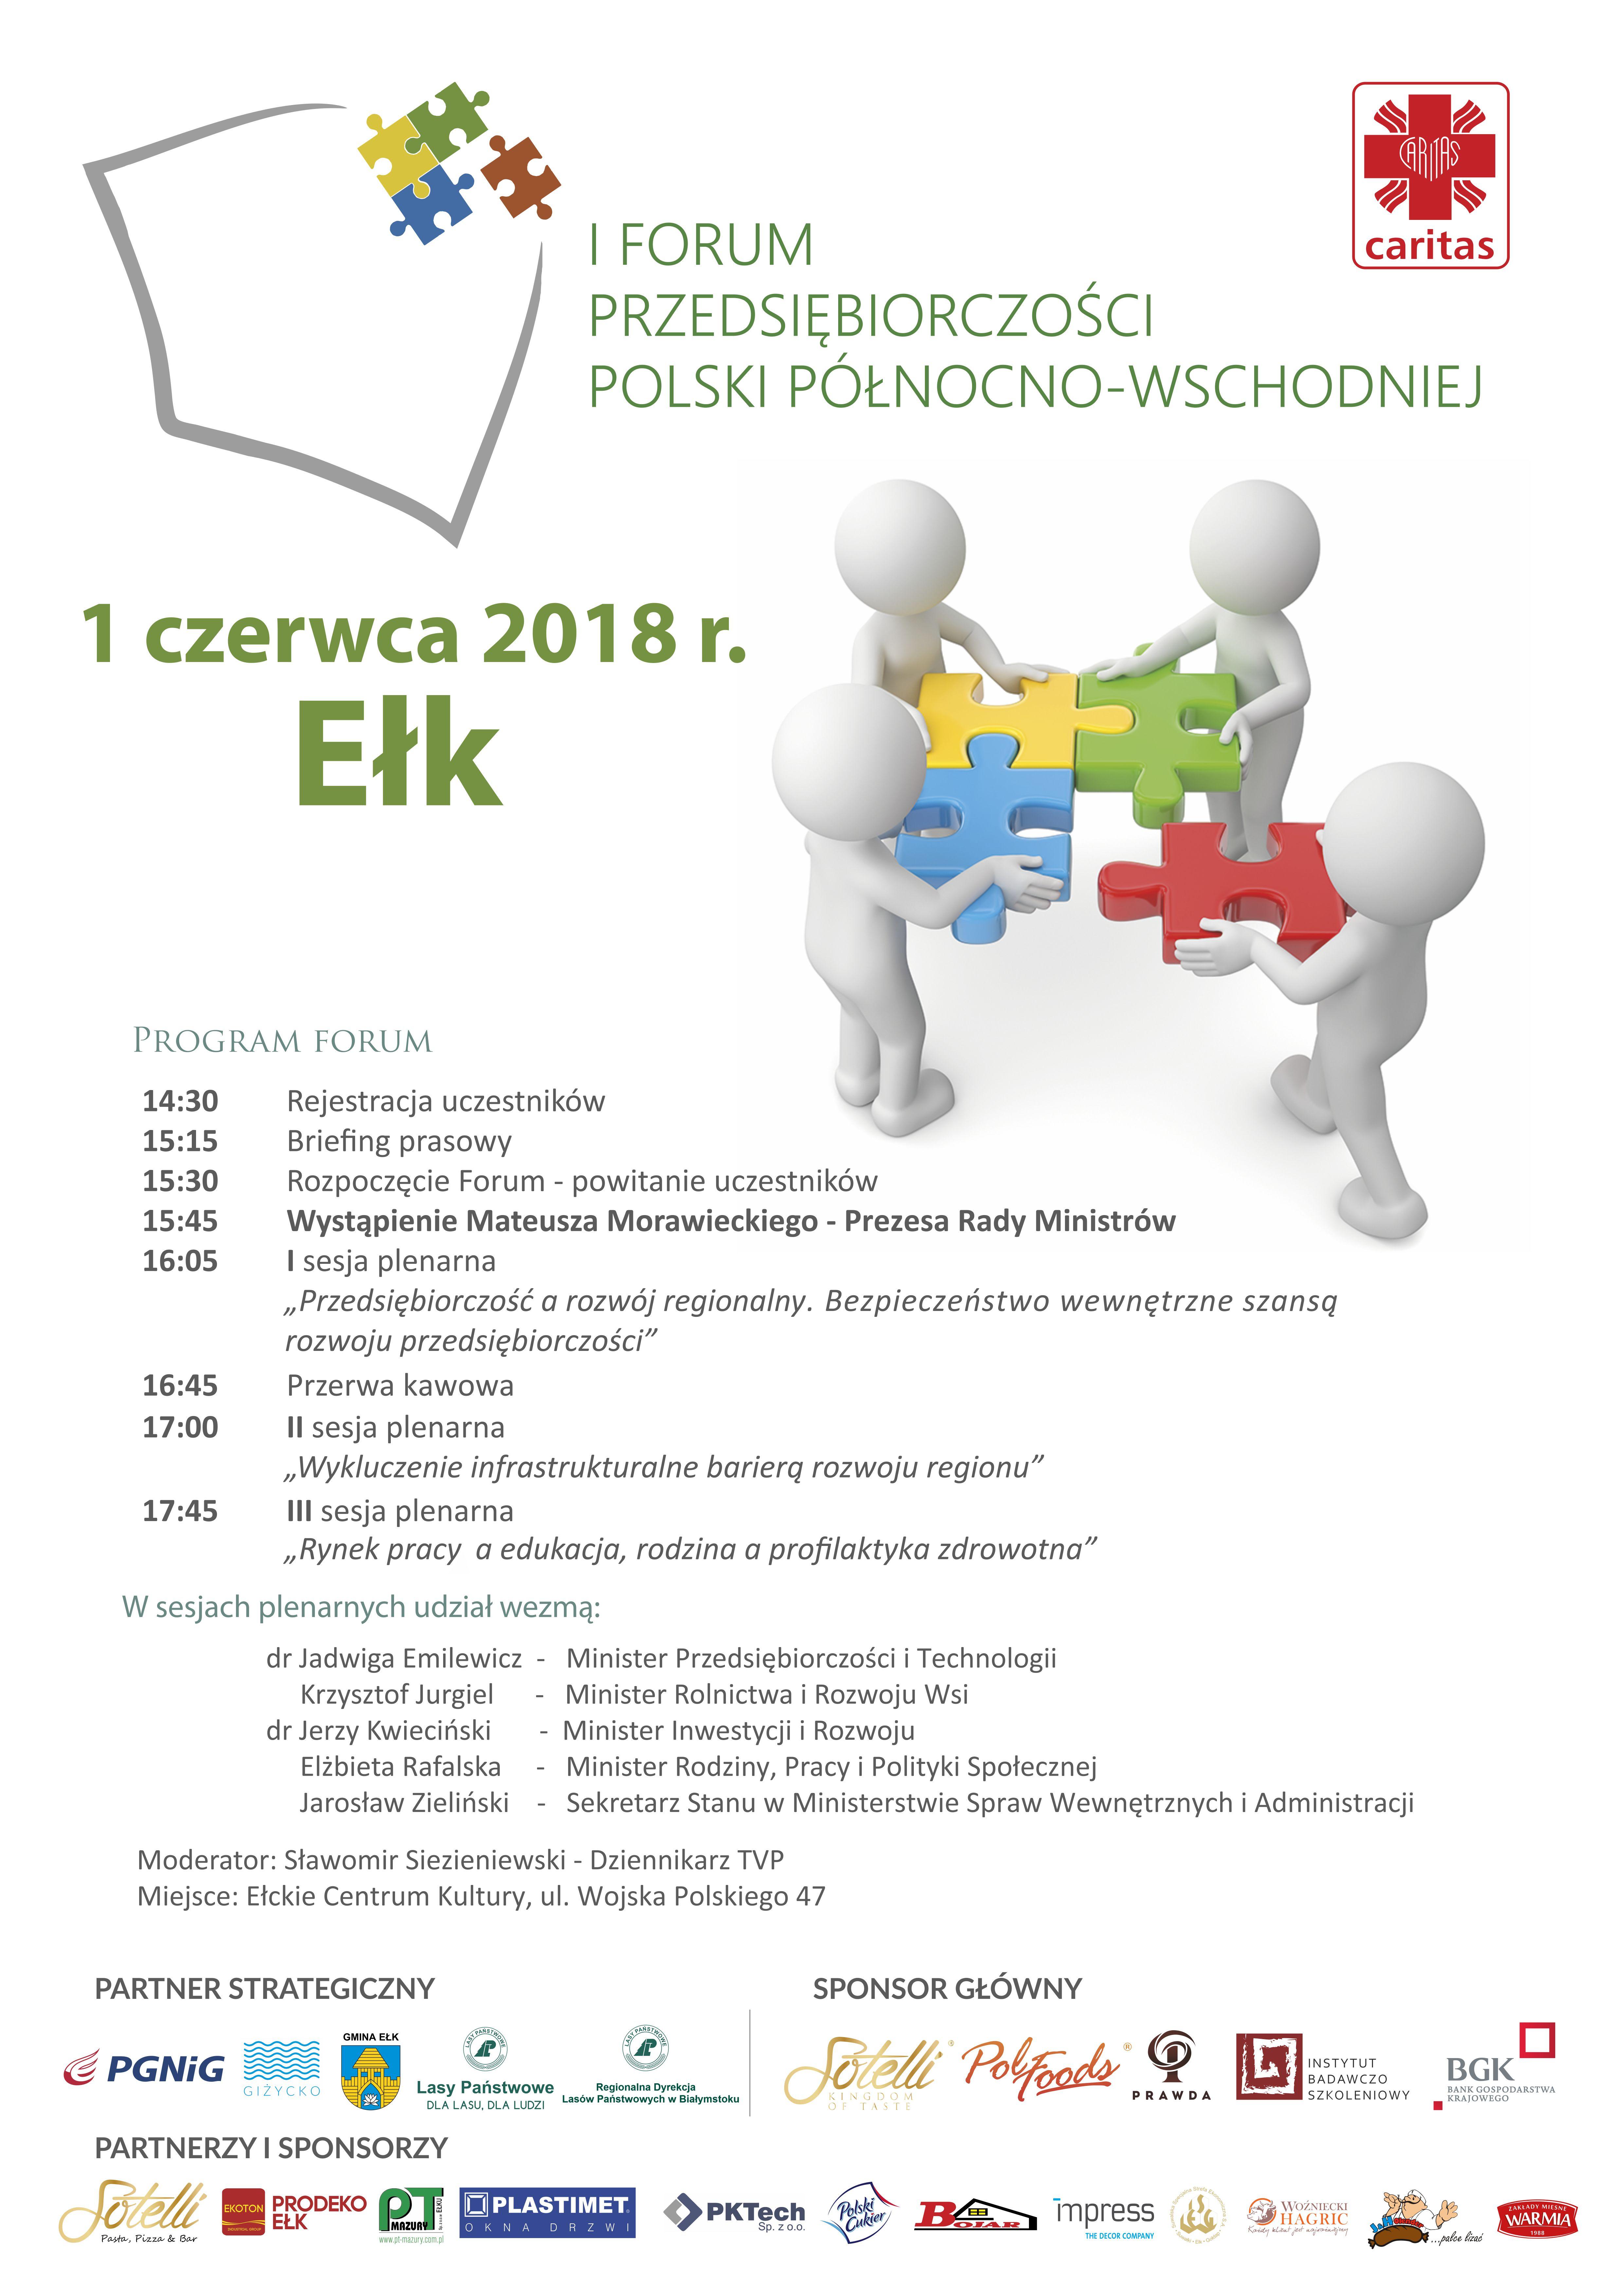 http://m.wm.pl/2018/05/orig/plakat-forum-loga-469878.jpg